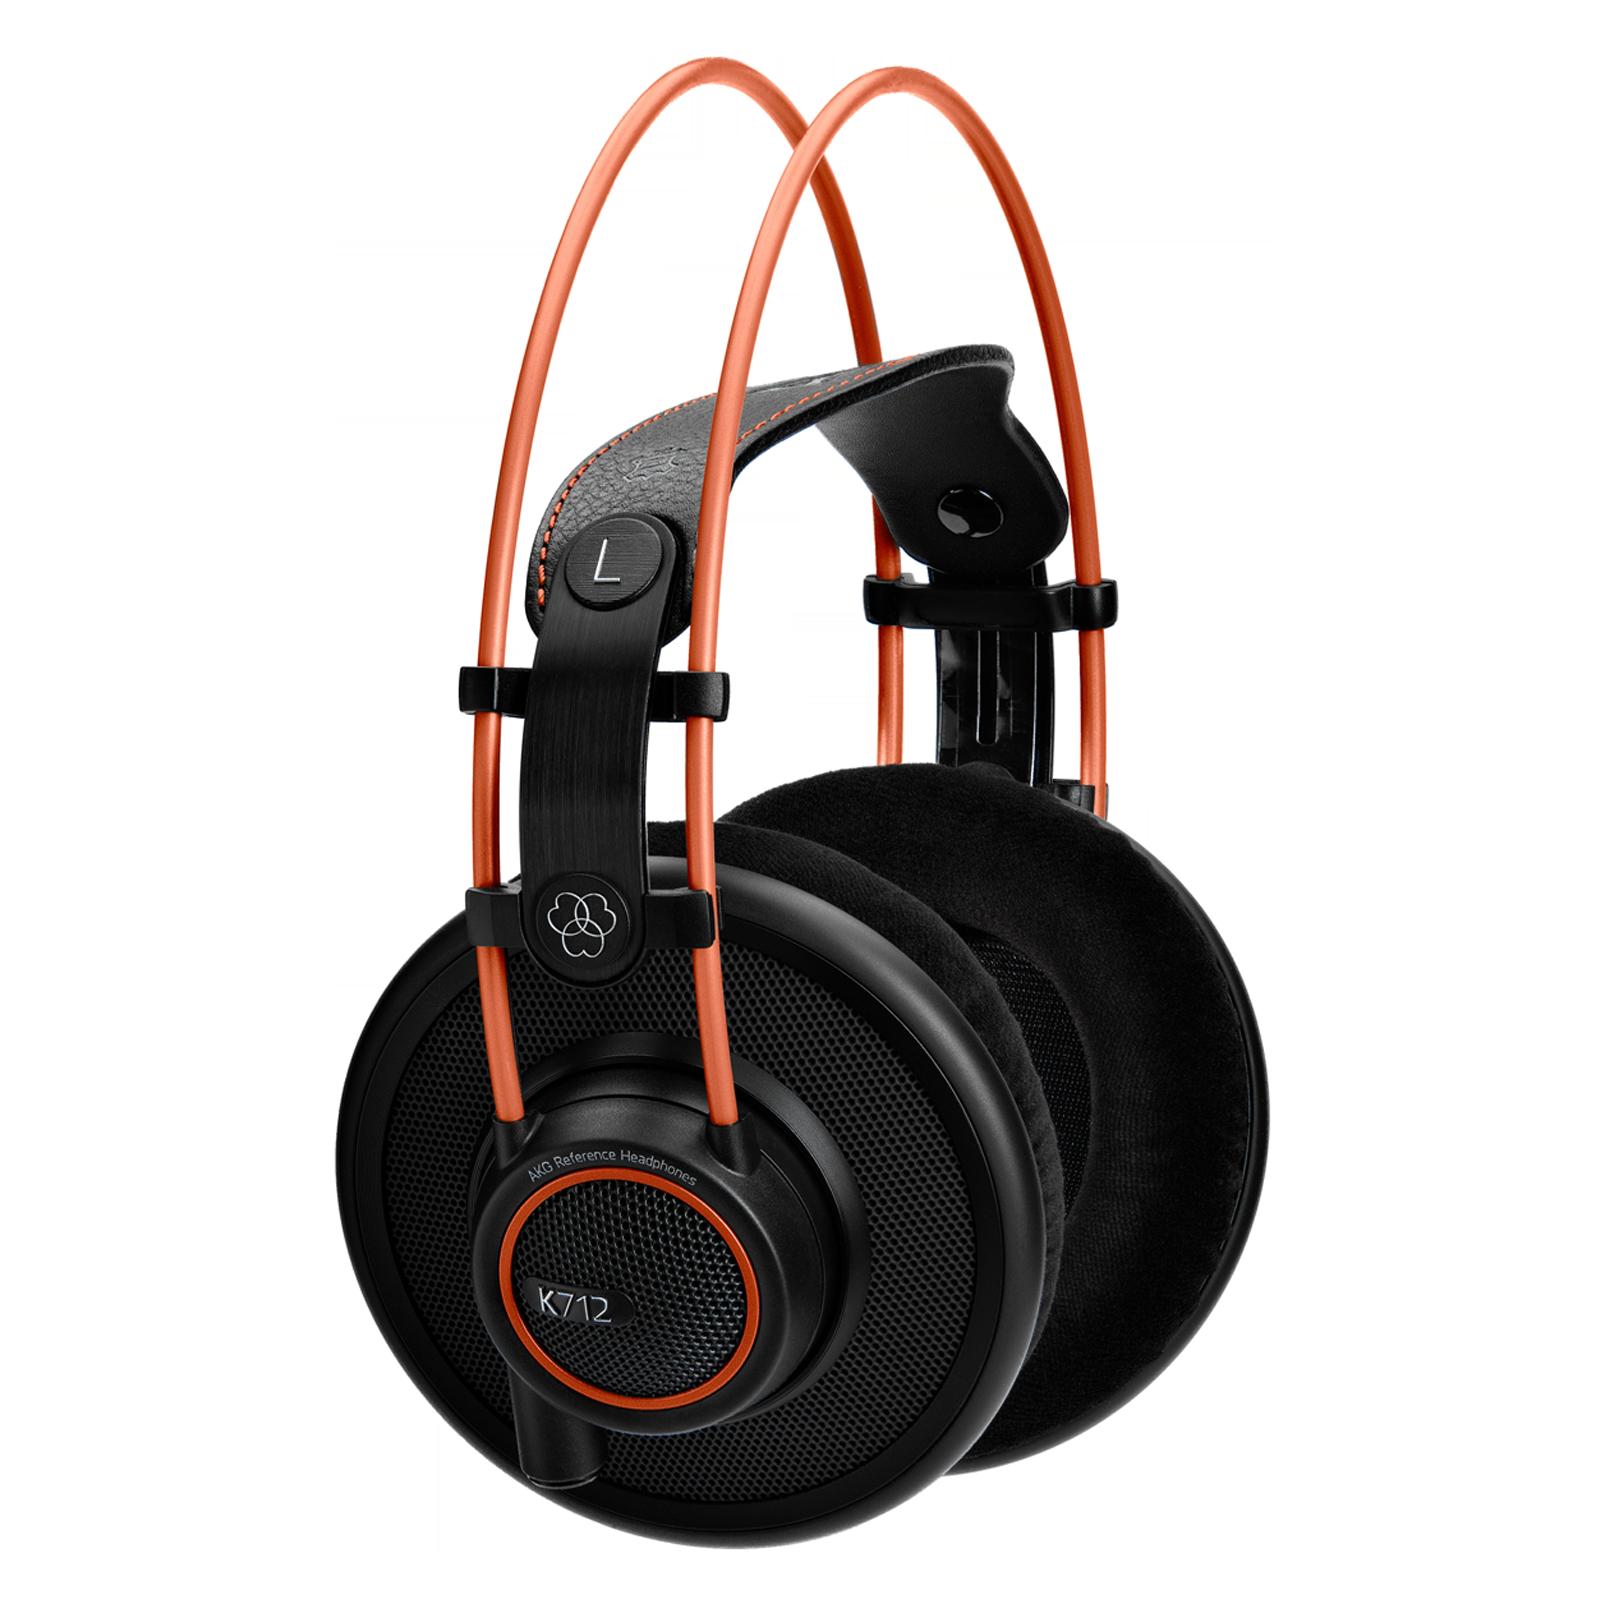 K712 PRO - Black - Reference studio headphones  - Hero